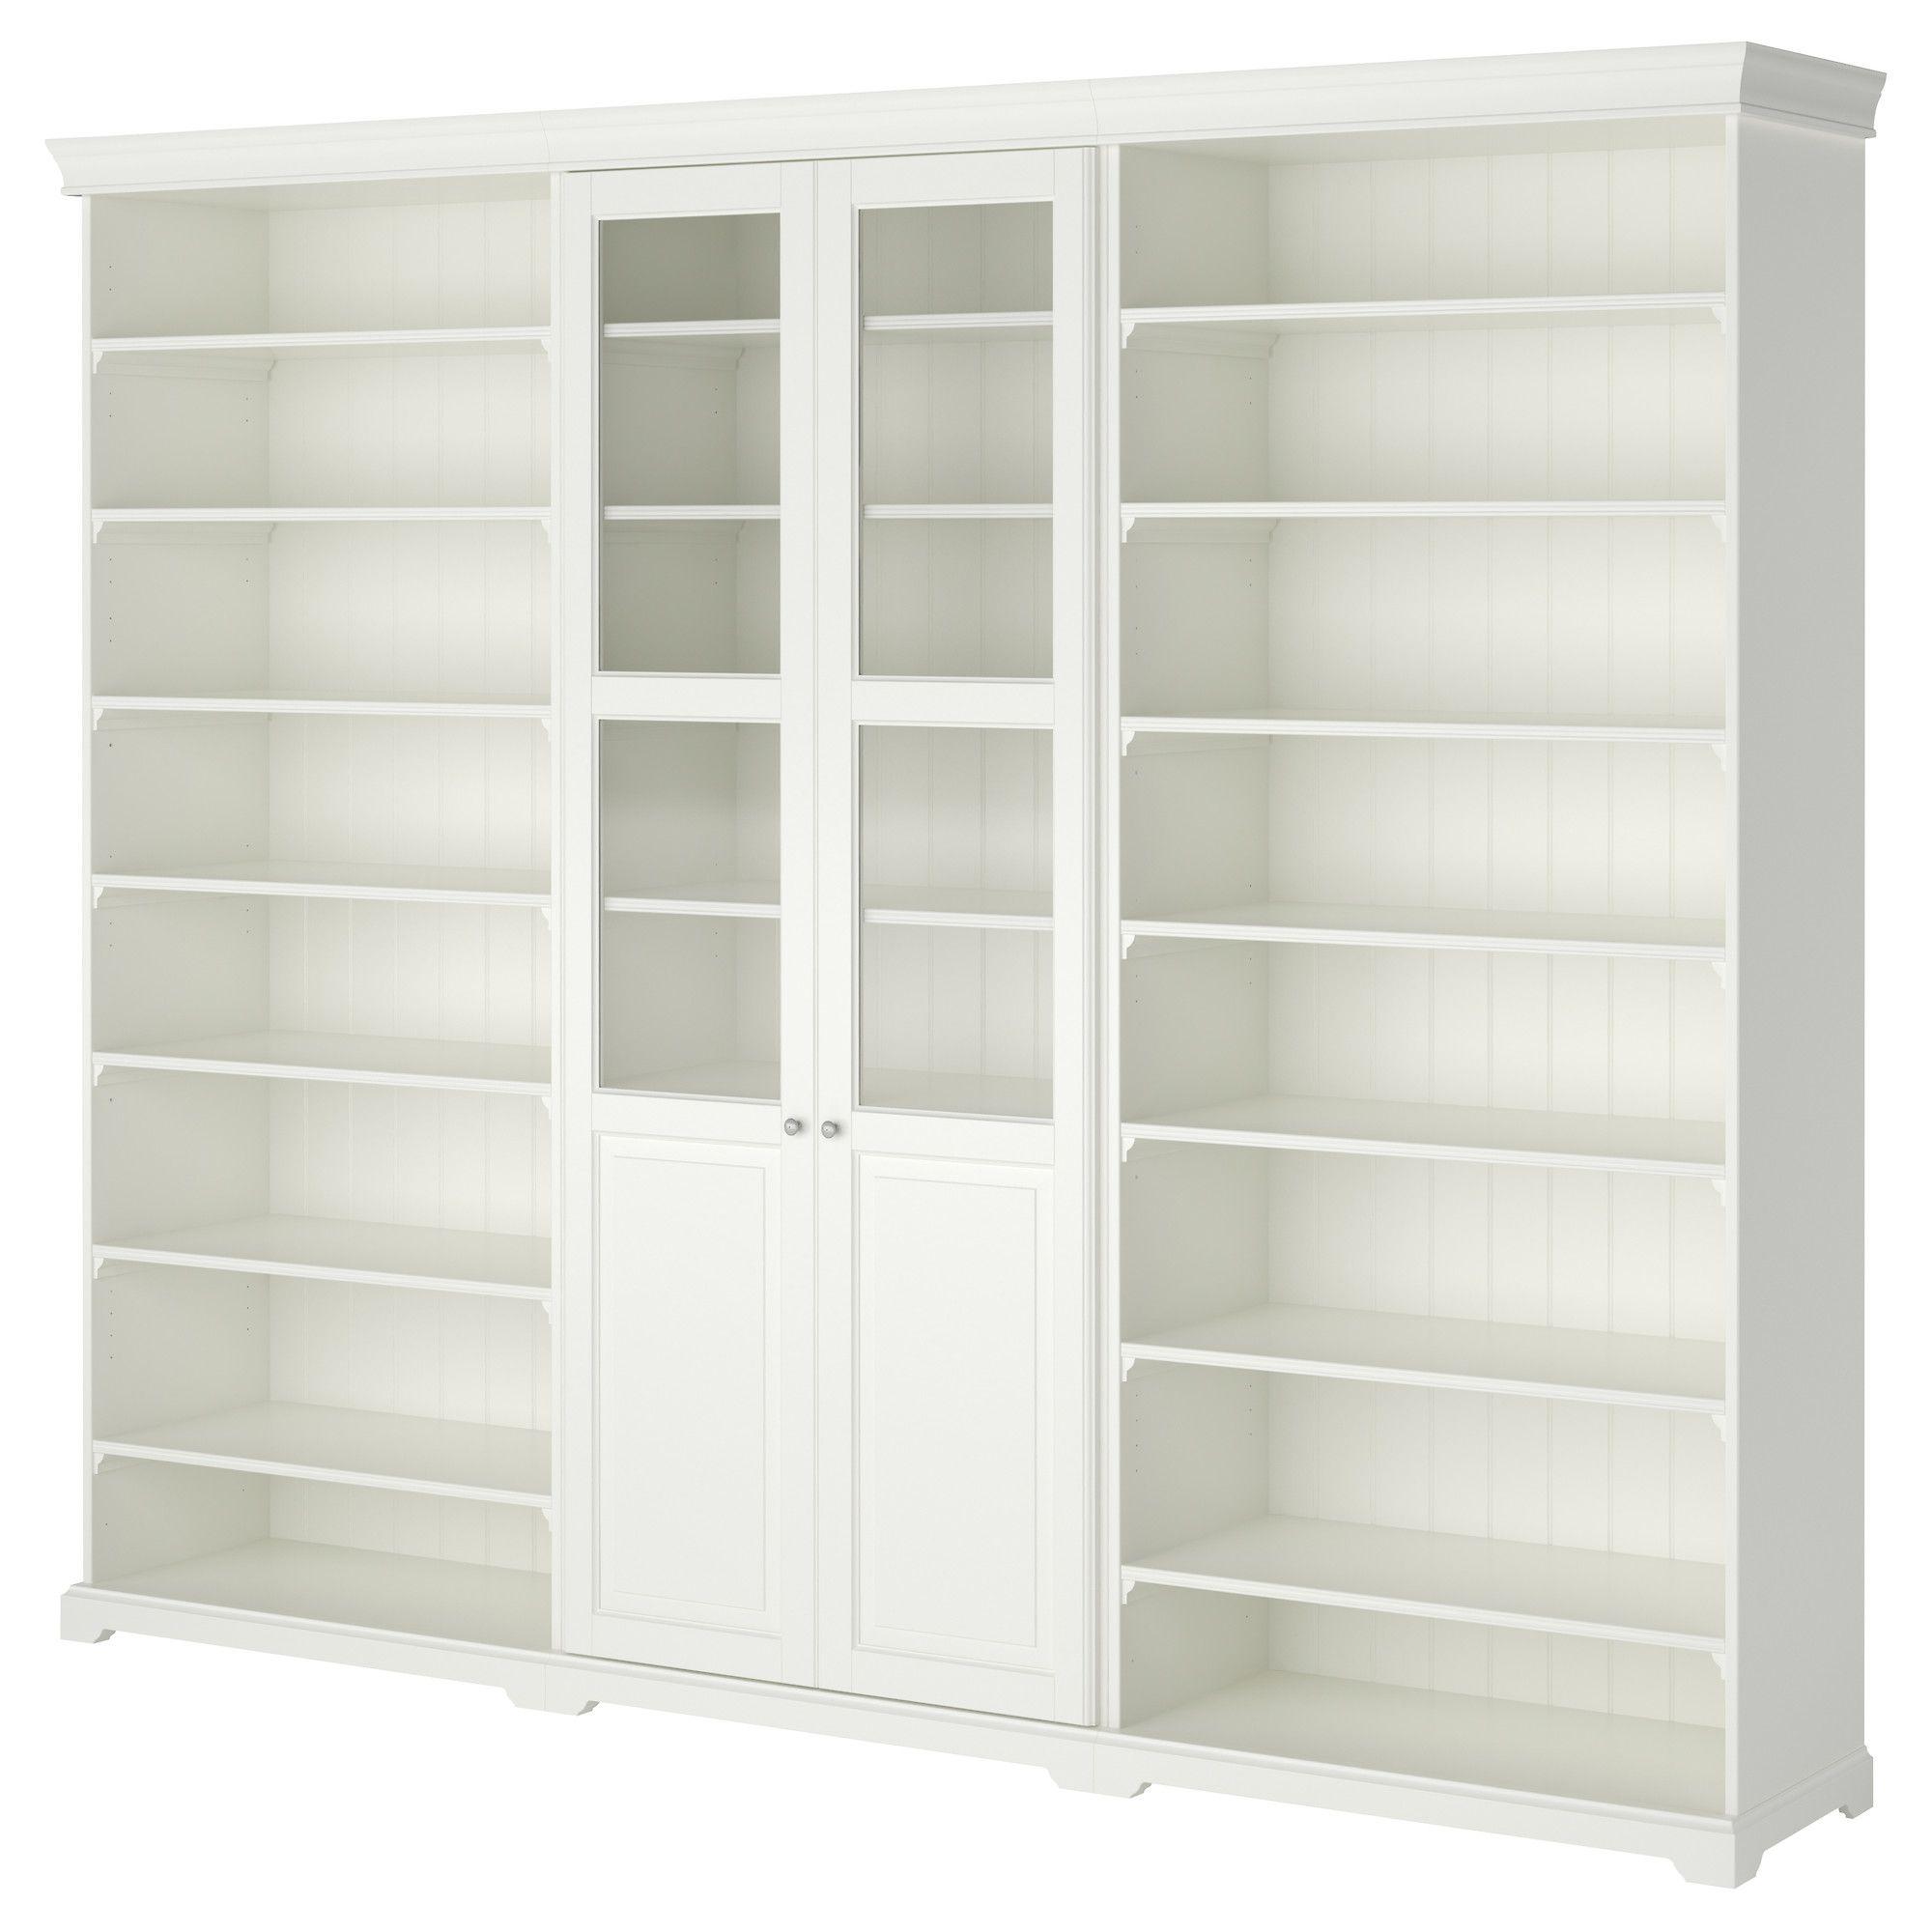 Ikea Liatorp Meuble De Rangement Blanc Craft Room